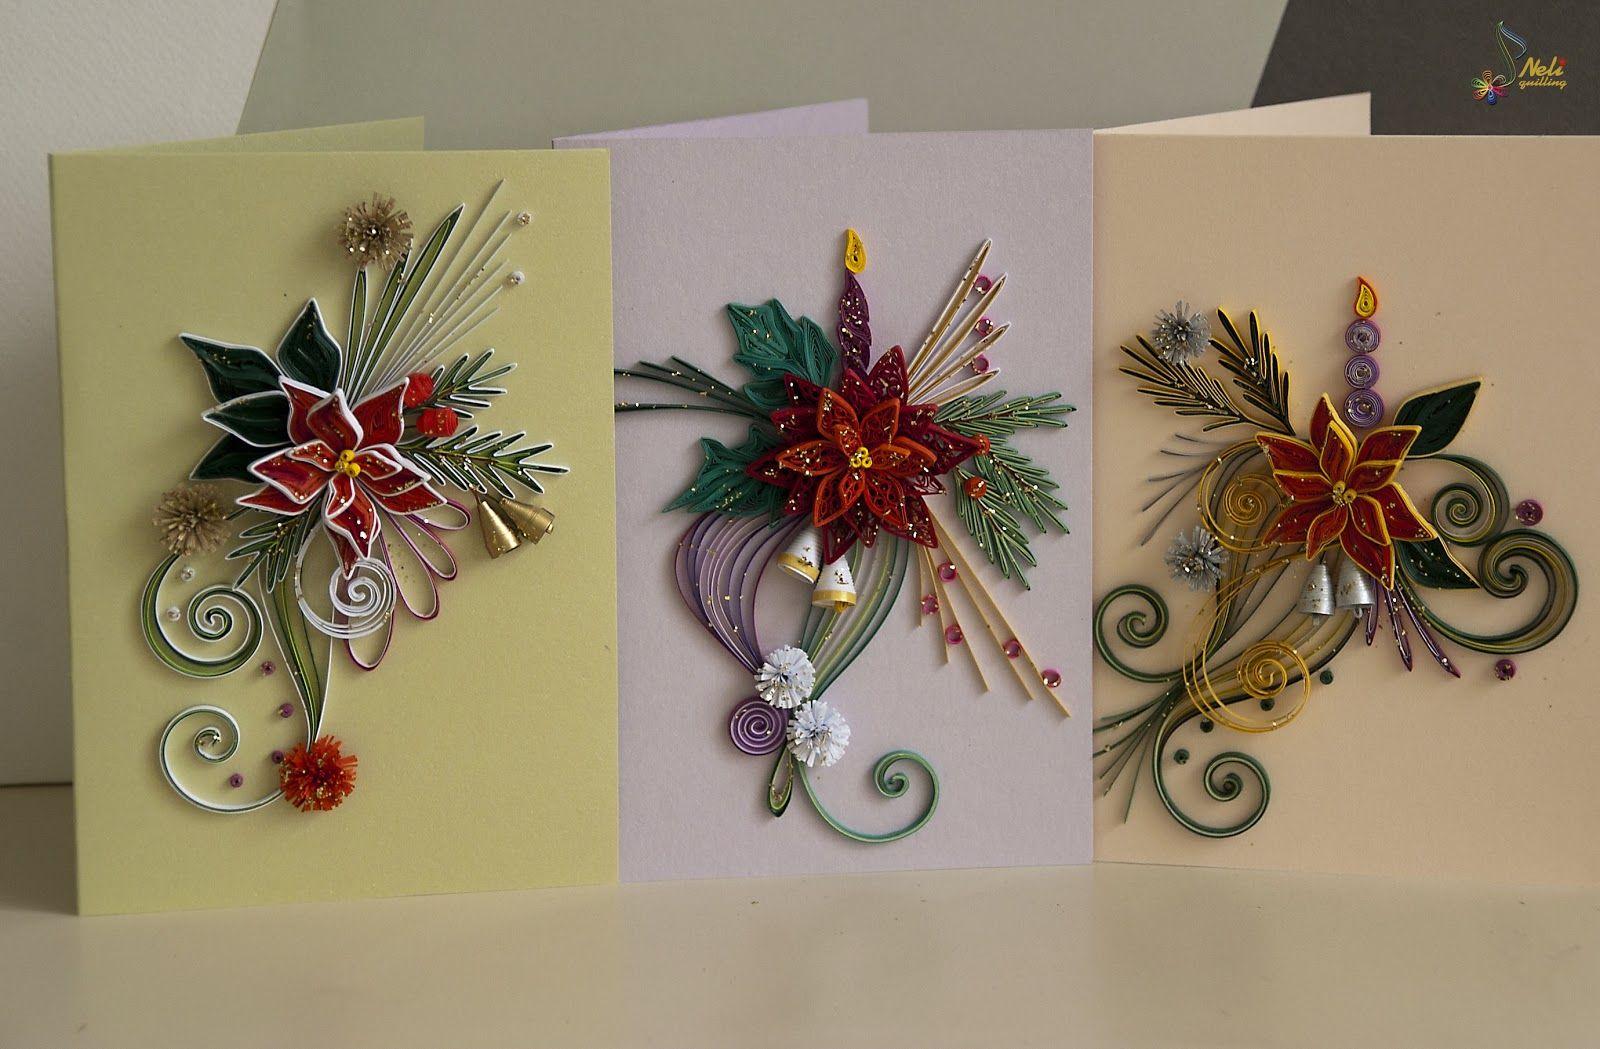 neli: Preparation for Christmas 2012 _ # 1